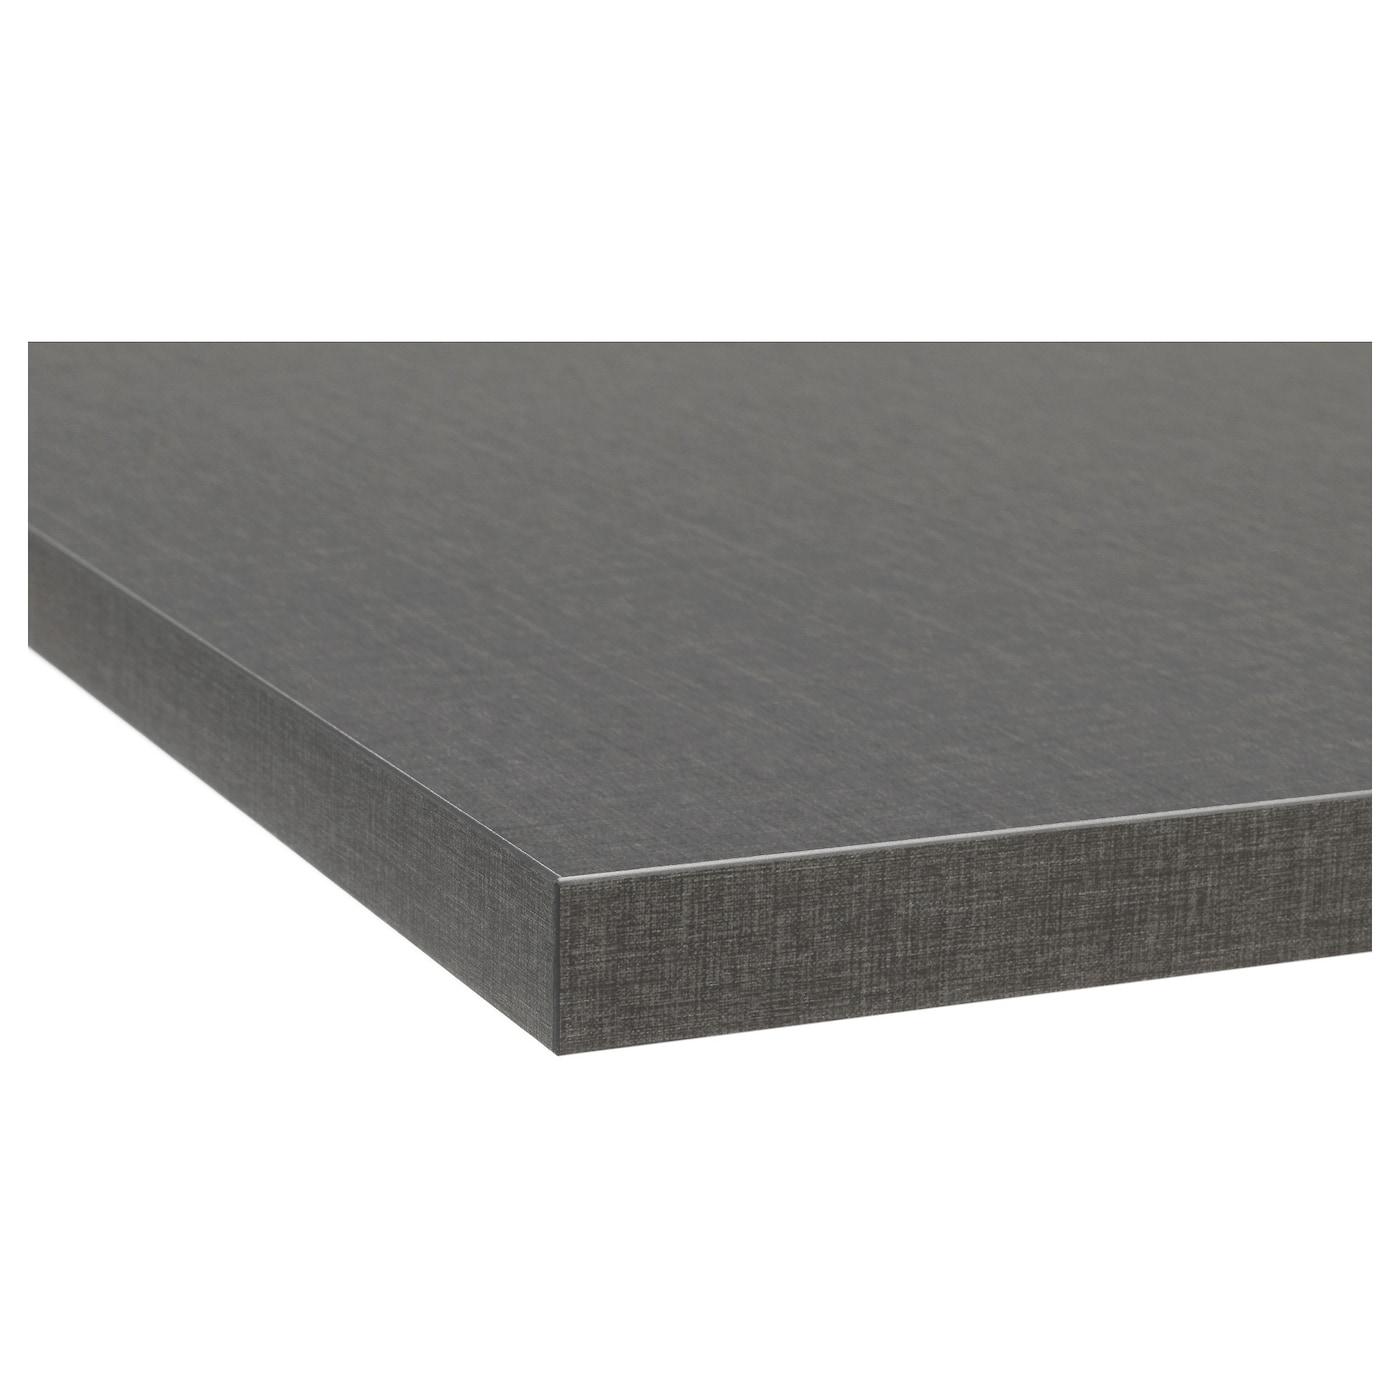 Ekbacken plan de travail sur mesure gris fonc motif lin for Plan de travail stratifie sur mesure